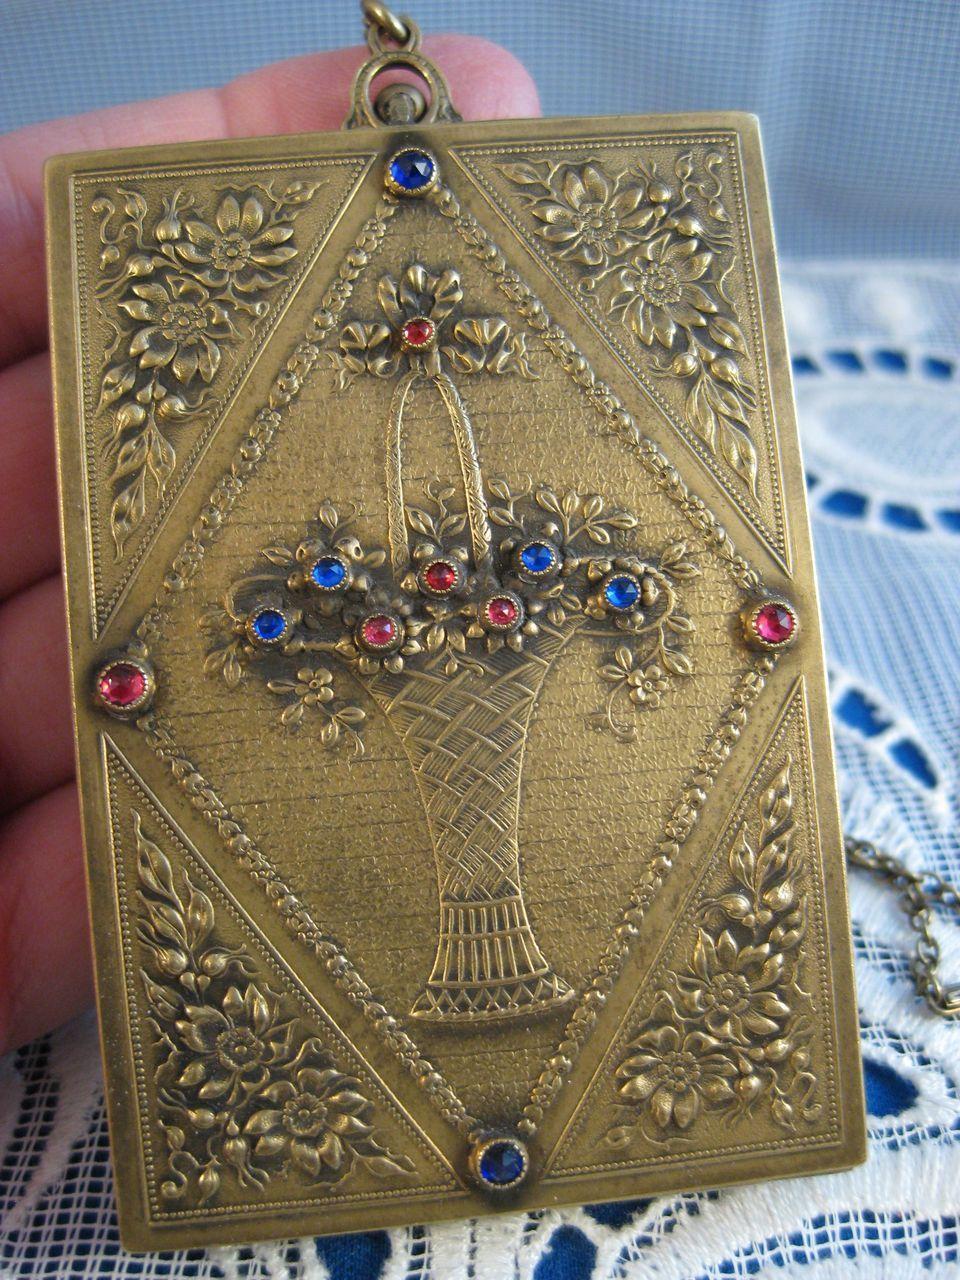 Flower Basket Jeweled Bronze Compact Cosmetic Wristlet